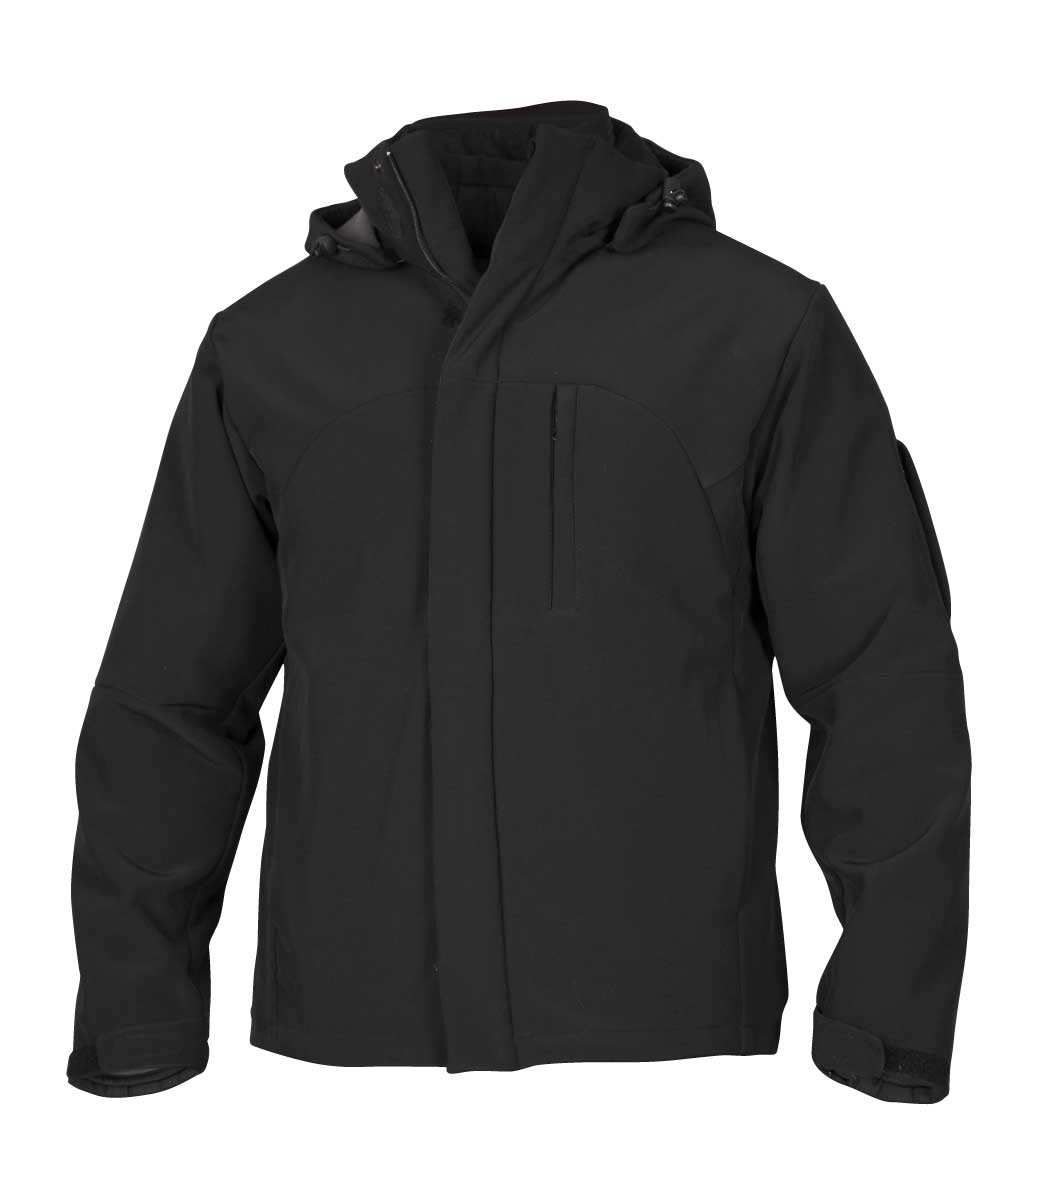 Softshell jakke, håndverksbukse og vernesko ~ Ezzenza.no